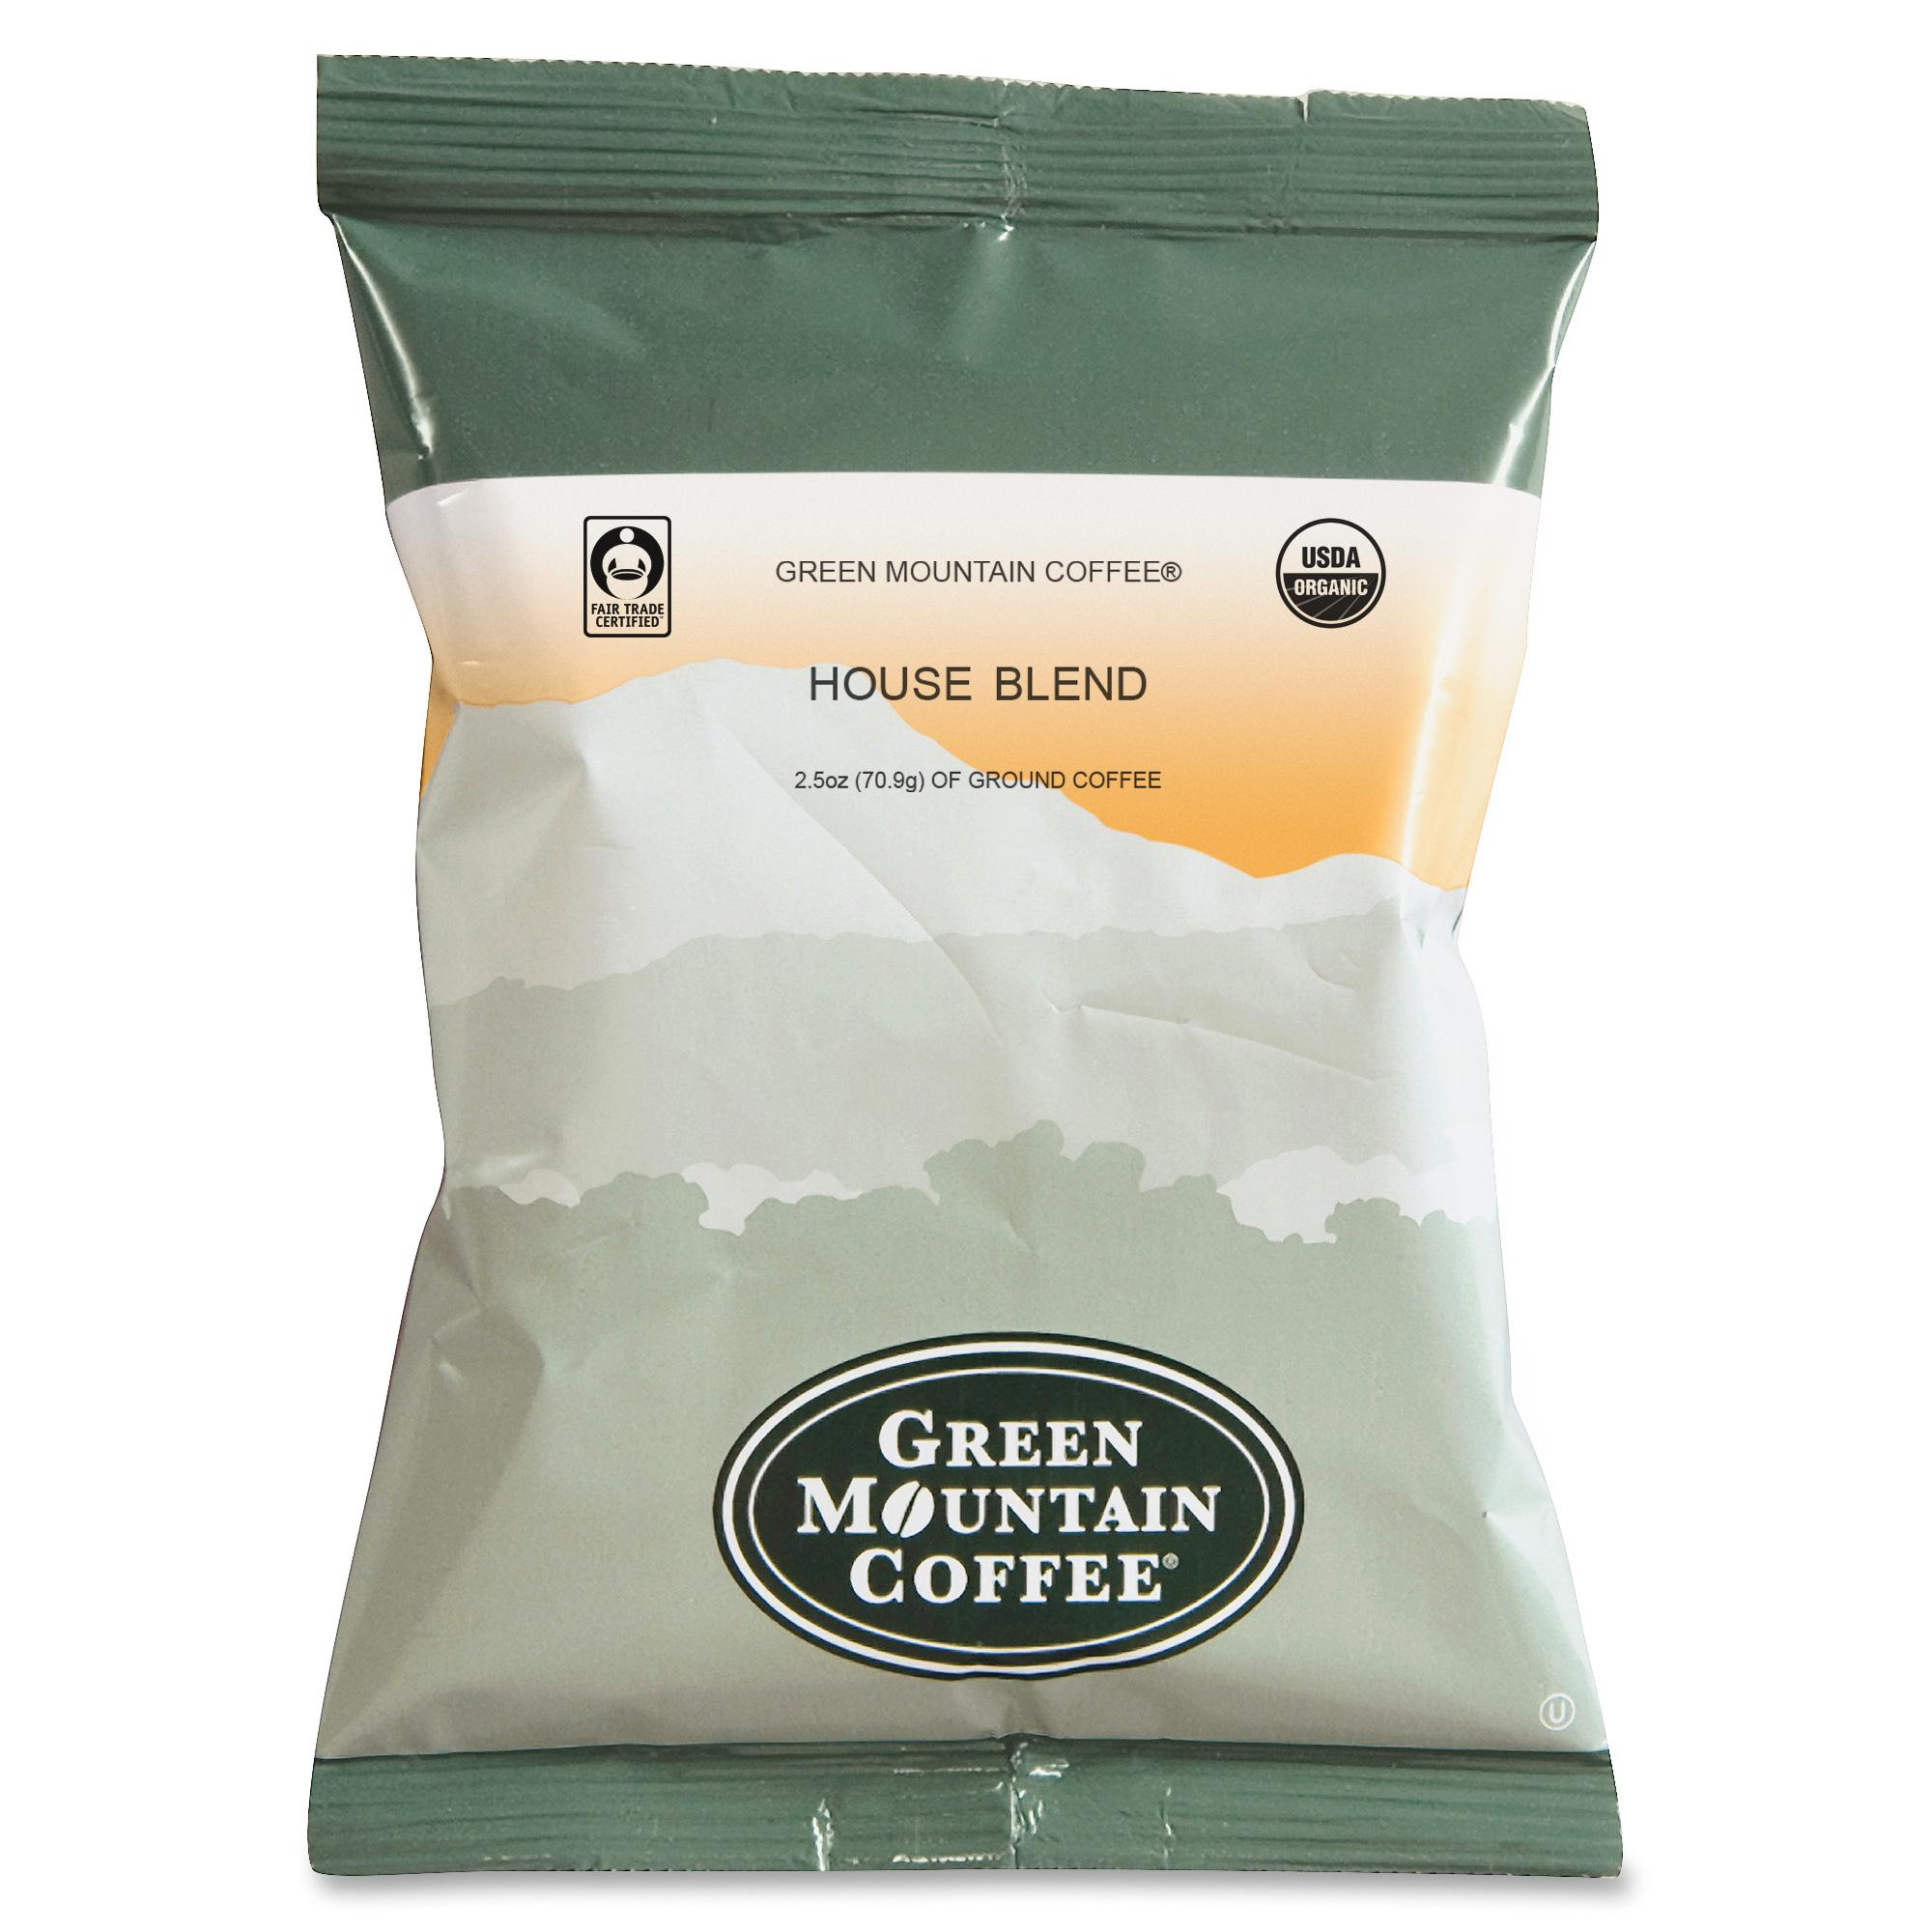 Green Mountain Coffee Roasters Fair Trade Organic House Blend Coffee Fractional Packs 2.5oz 50/Carton (Green Mountain Coffee Roasters 4493)